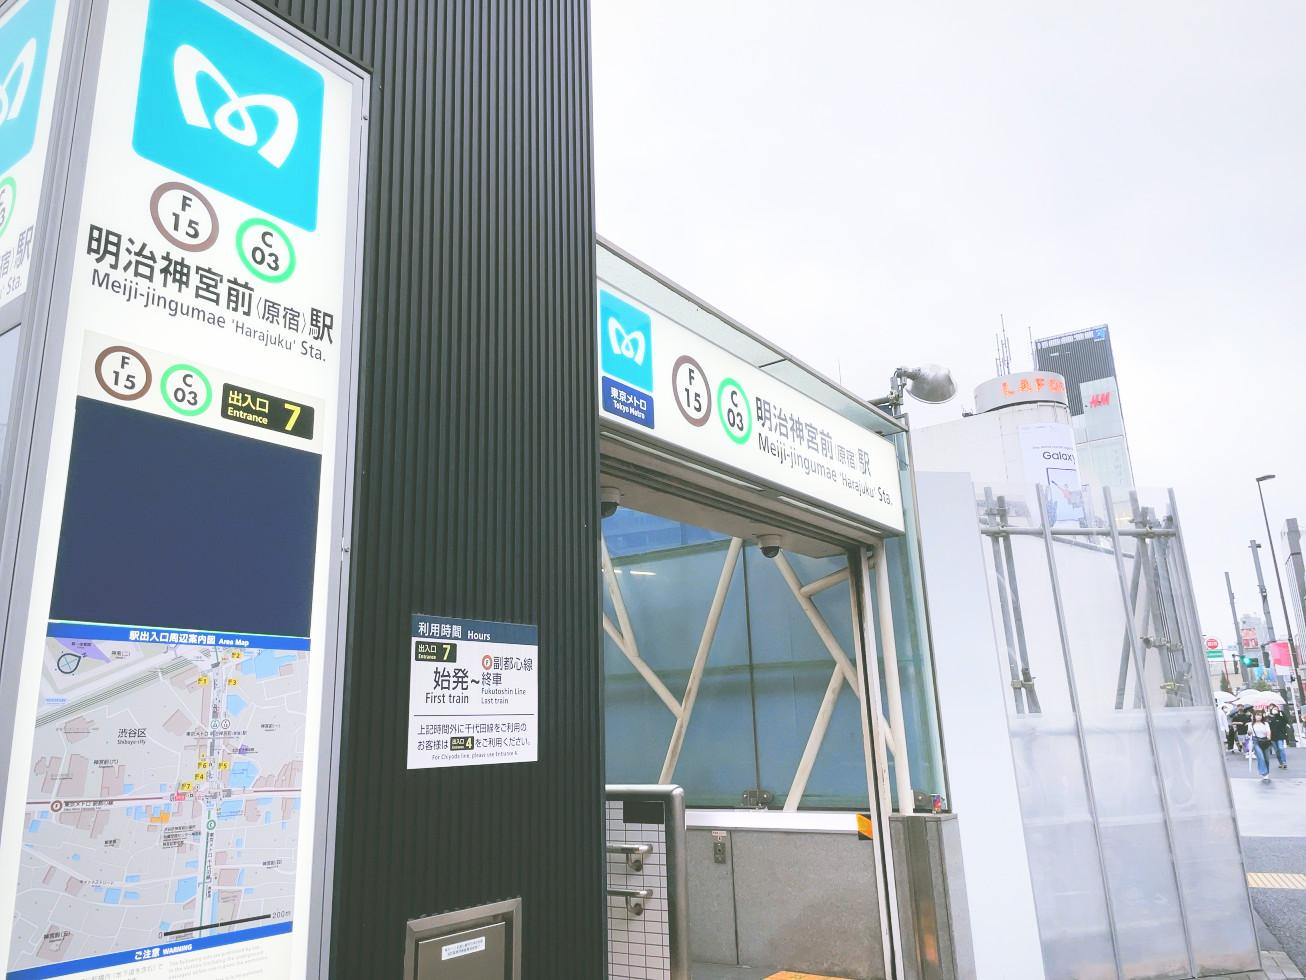 MYTHELミセルキュープラザ原宿店セルフエステ口コミ体験レポ